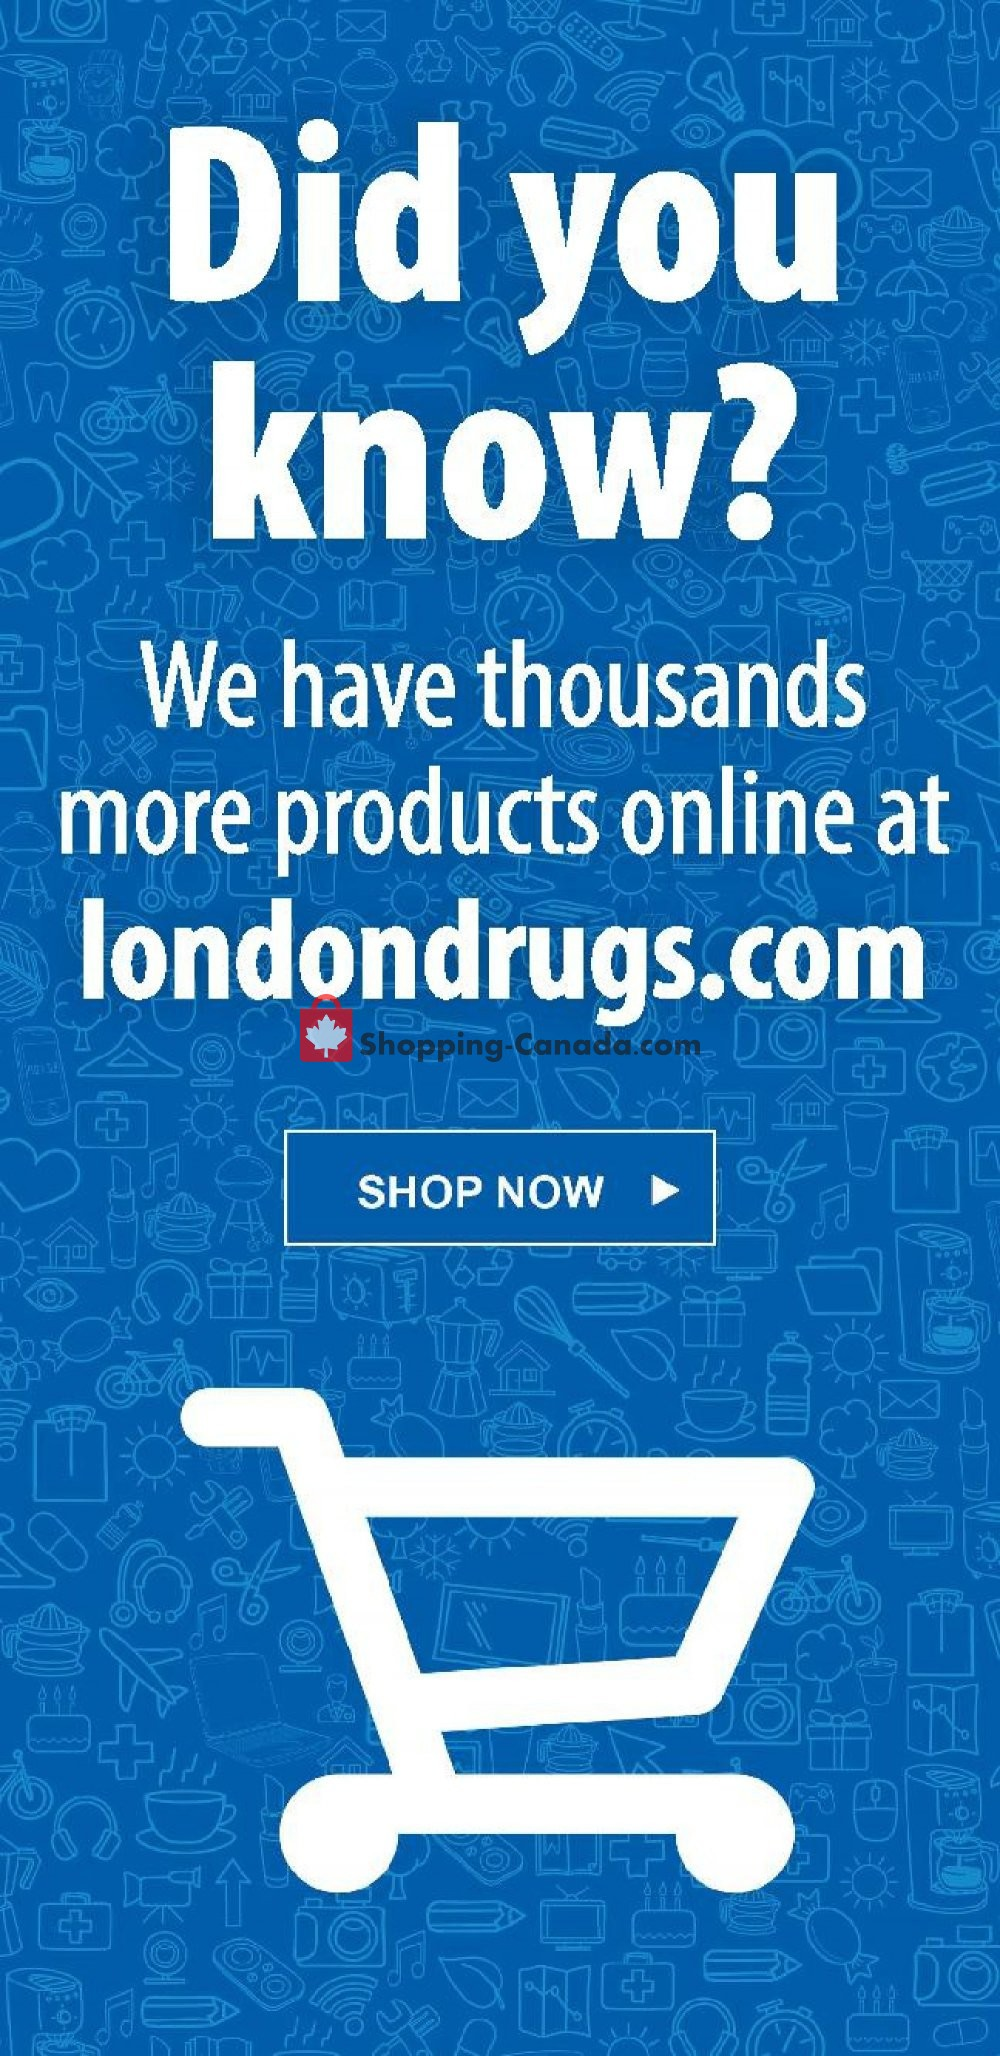 Flyer London Drugs Canada - from Thursday November 7, 2019 to Sunday November 17, 2019